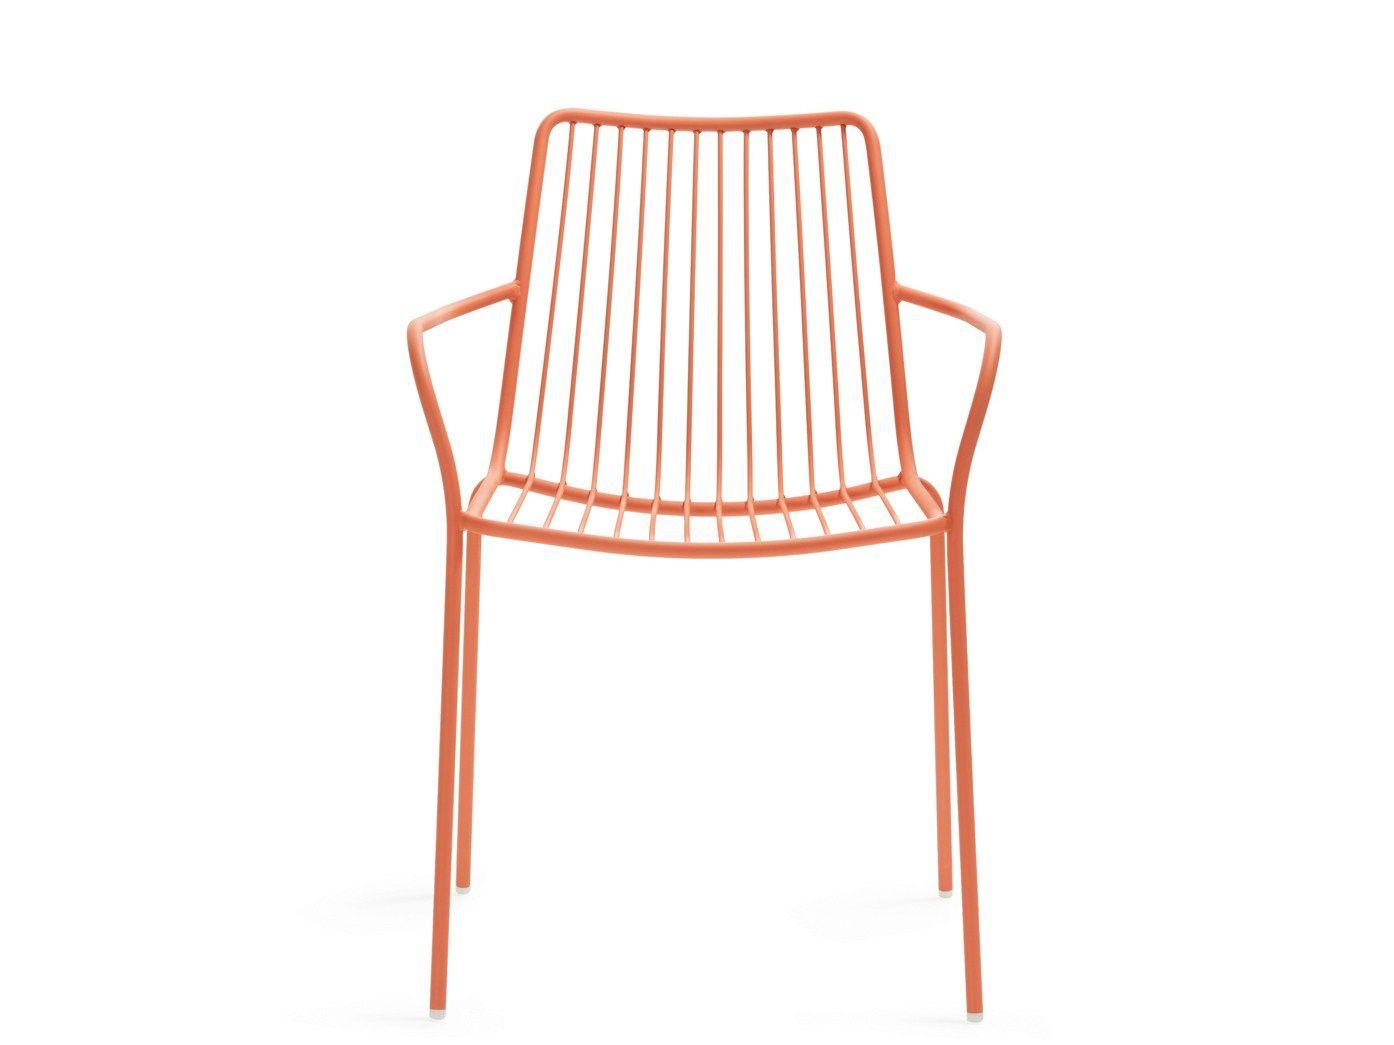 Chaise De Jardin Avec Accoudoir Awesome Greemotion Chaise